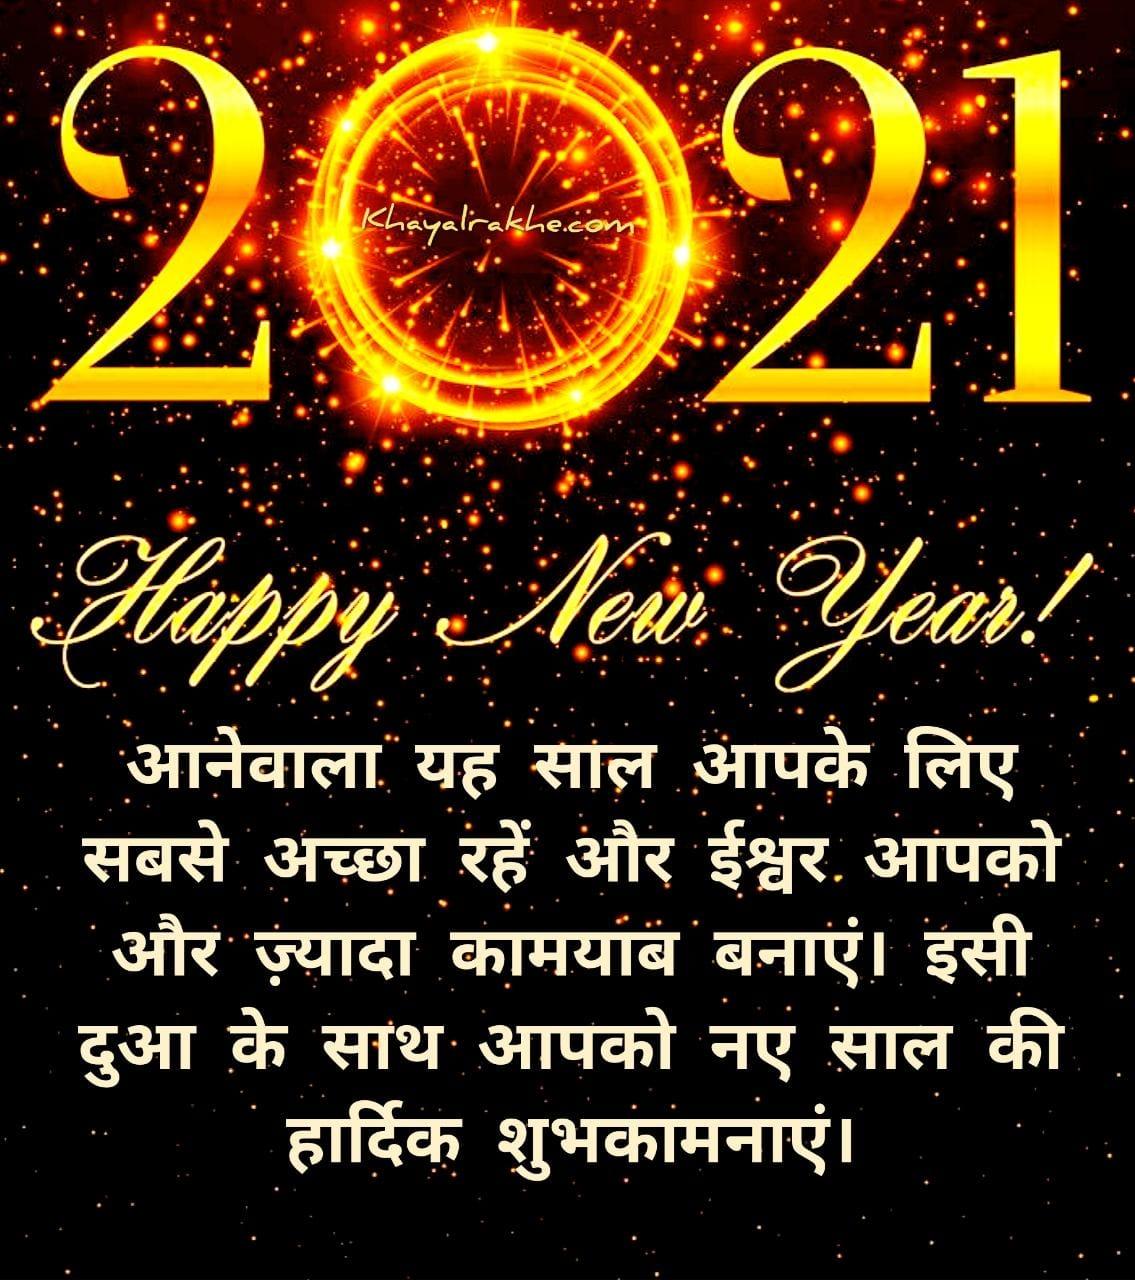 Happy New Year Wishes 2021 in Hindi - Status